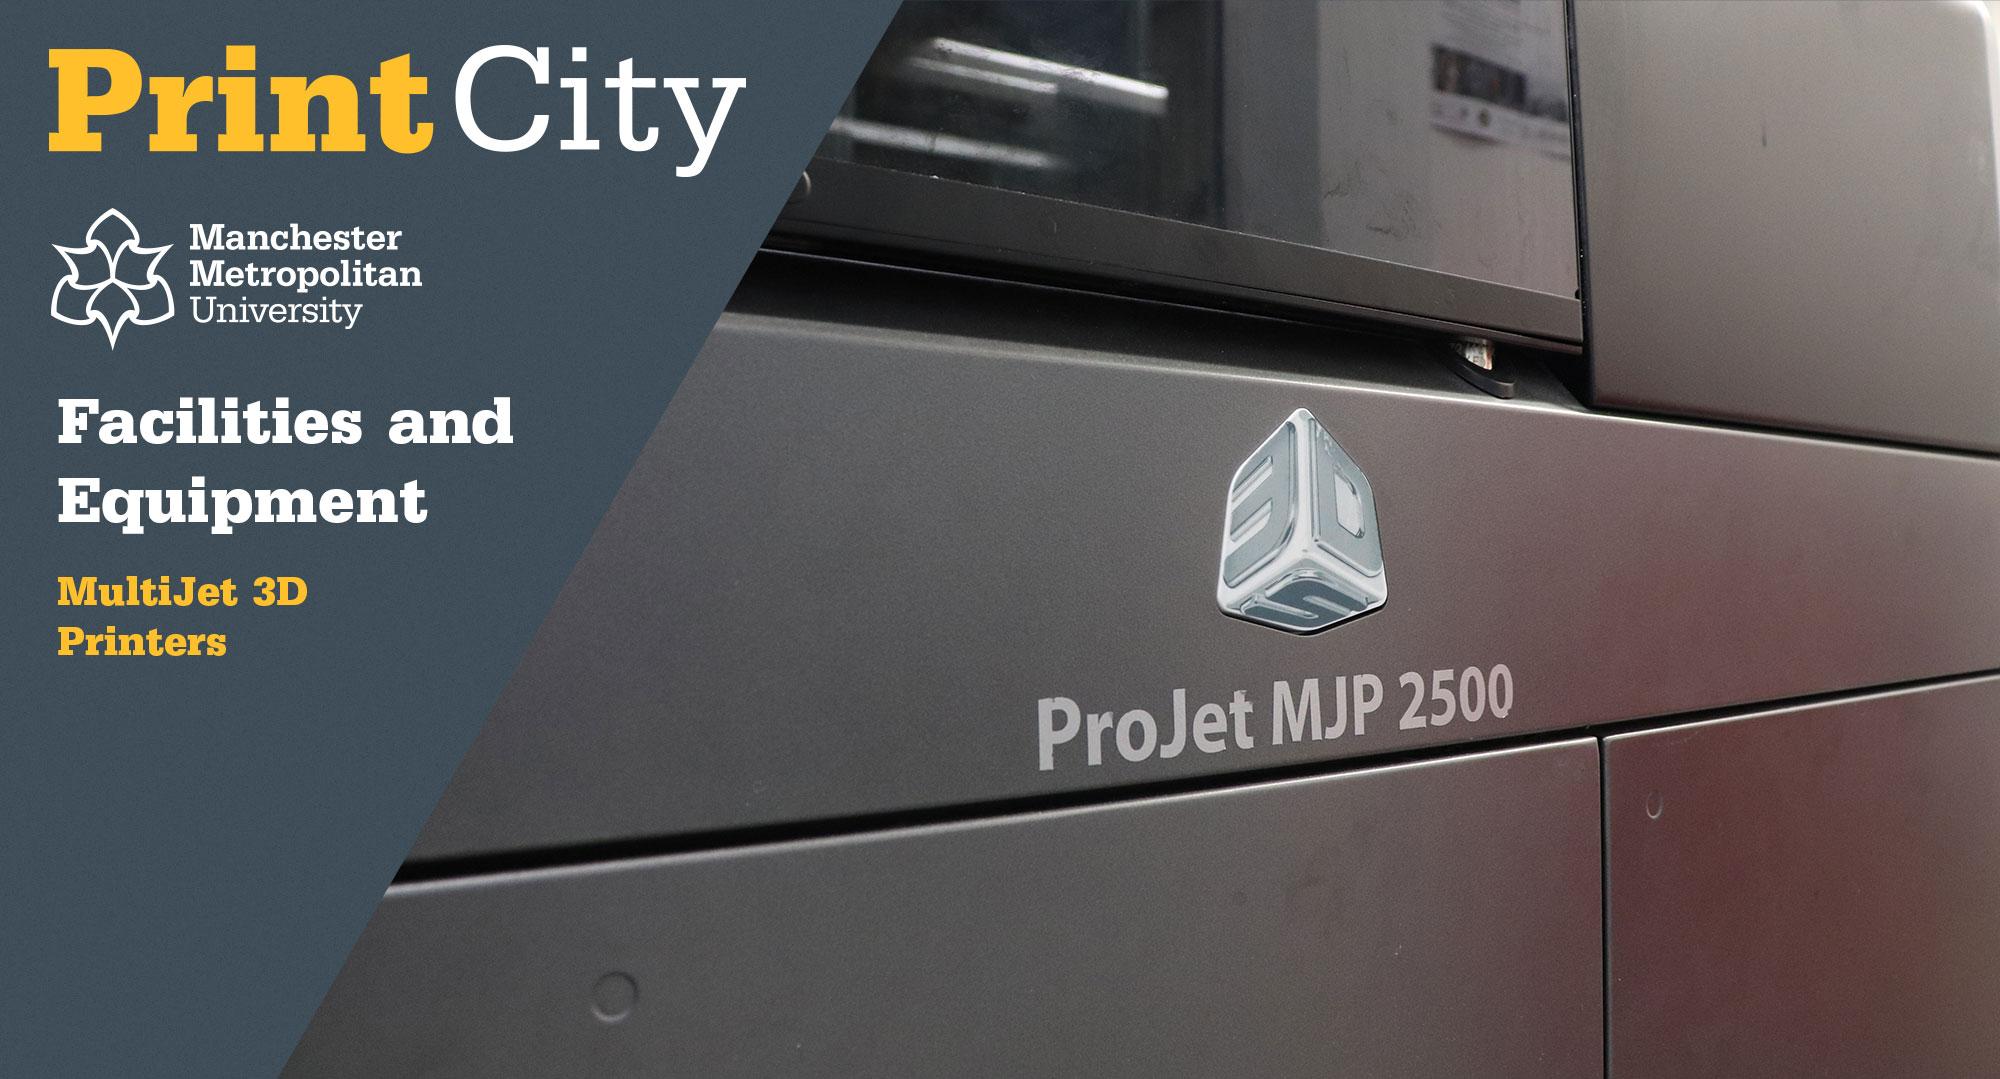 MultiJet 3D Printers - PrintCity - Manchester Metropolitan University - Facilities and Equipment